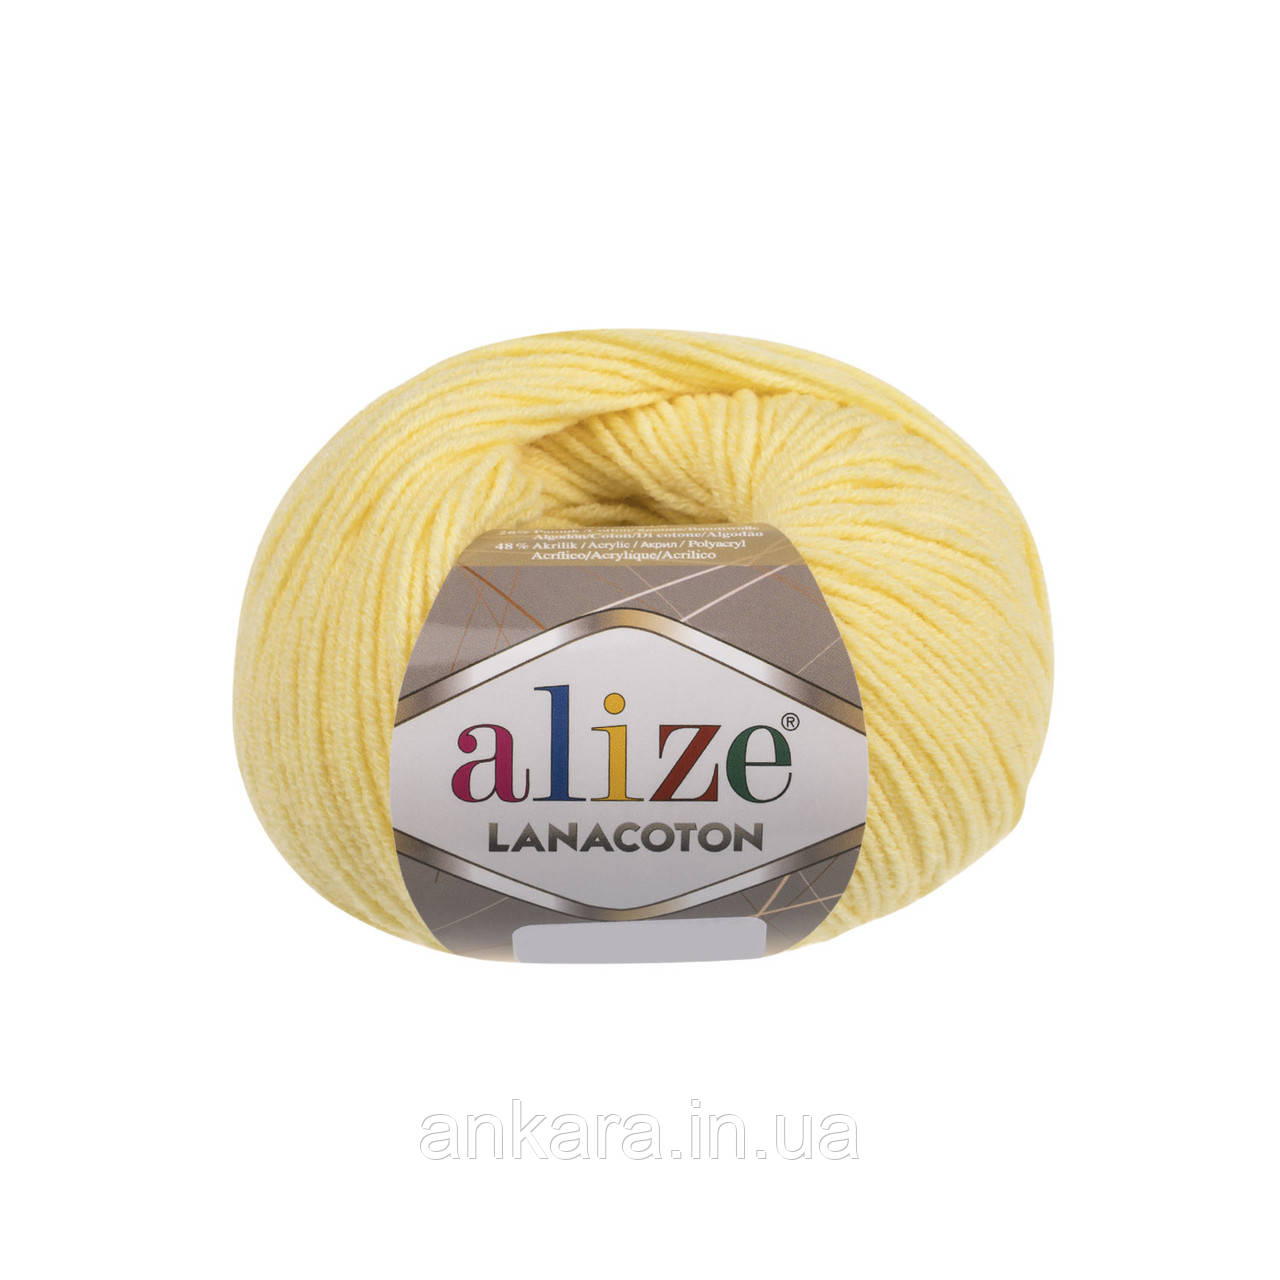 Alize Lanacoton 187